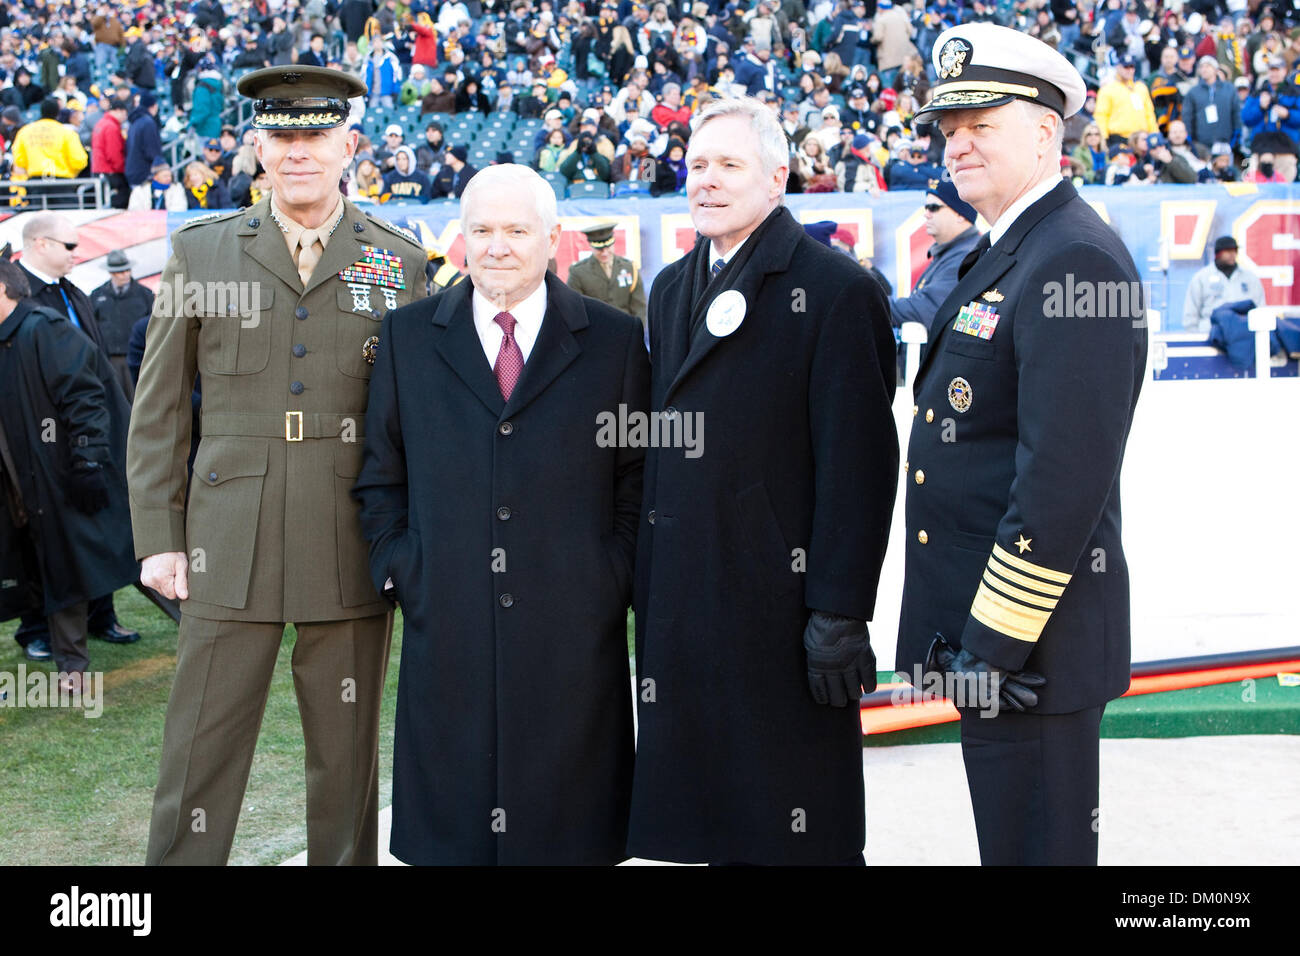 Dec. 12, 2009 - Philadelphia, Pennsylvania, U.S - 12 December 2009: Commandant of the Marine Corps Gen. James T. Stock Photo